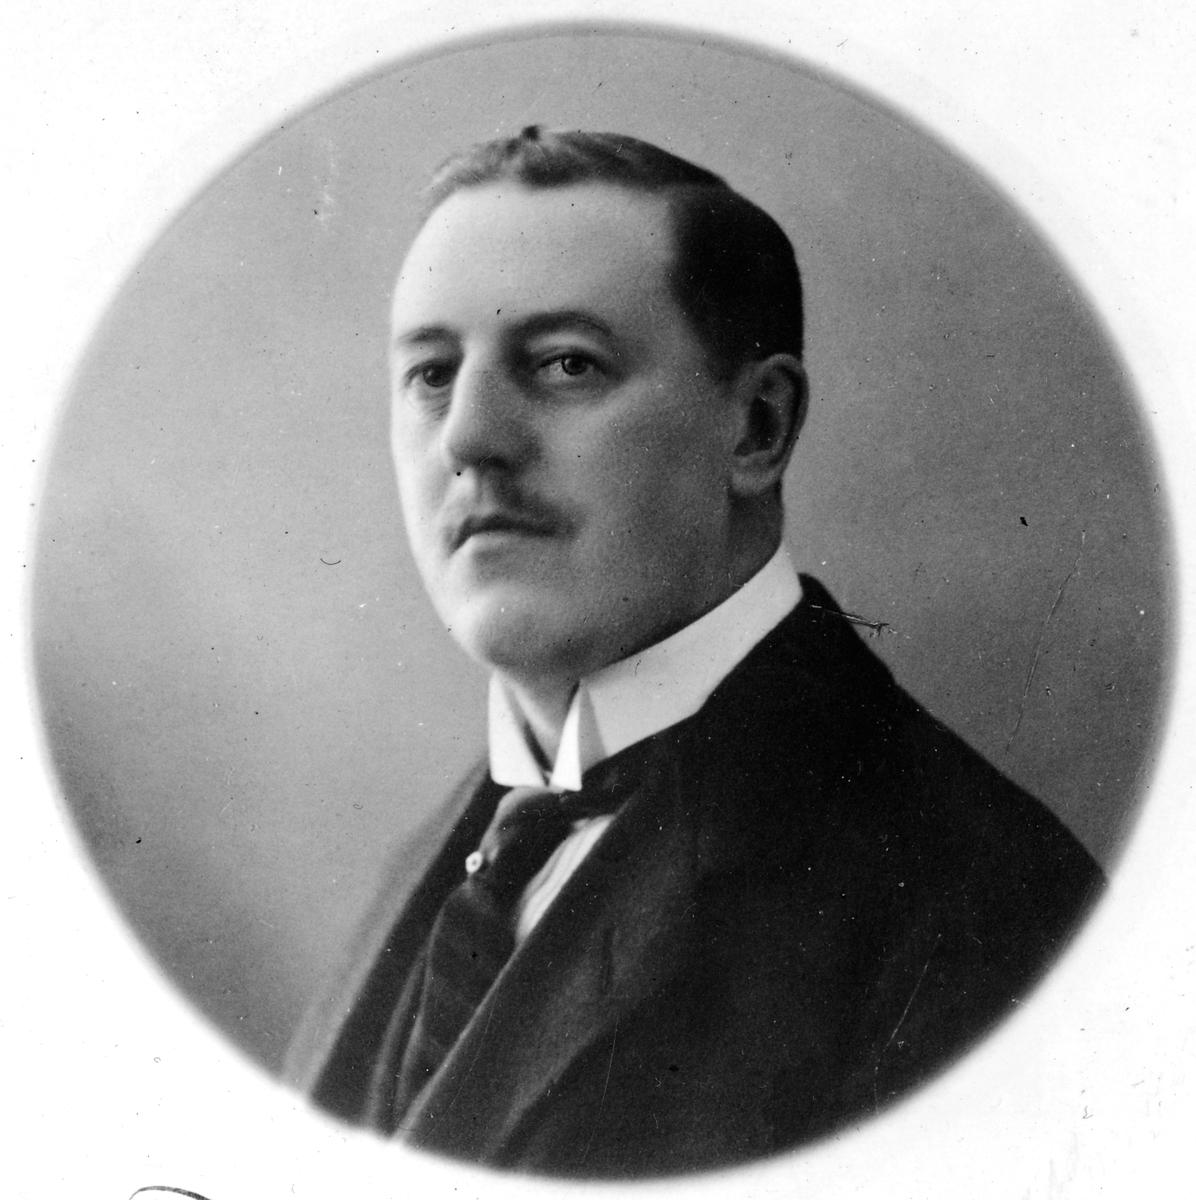 Stationsinspektor Abraham Victor Birger Pfeiff.